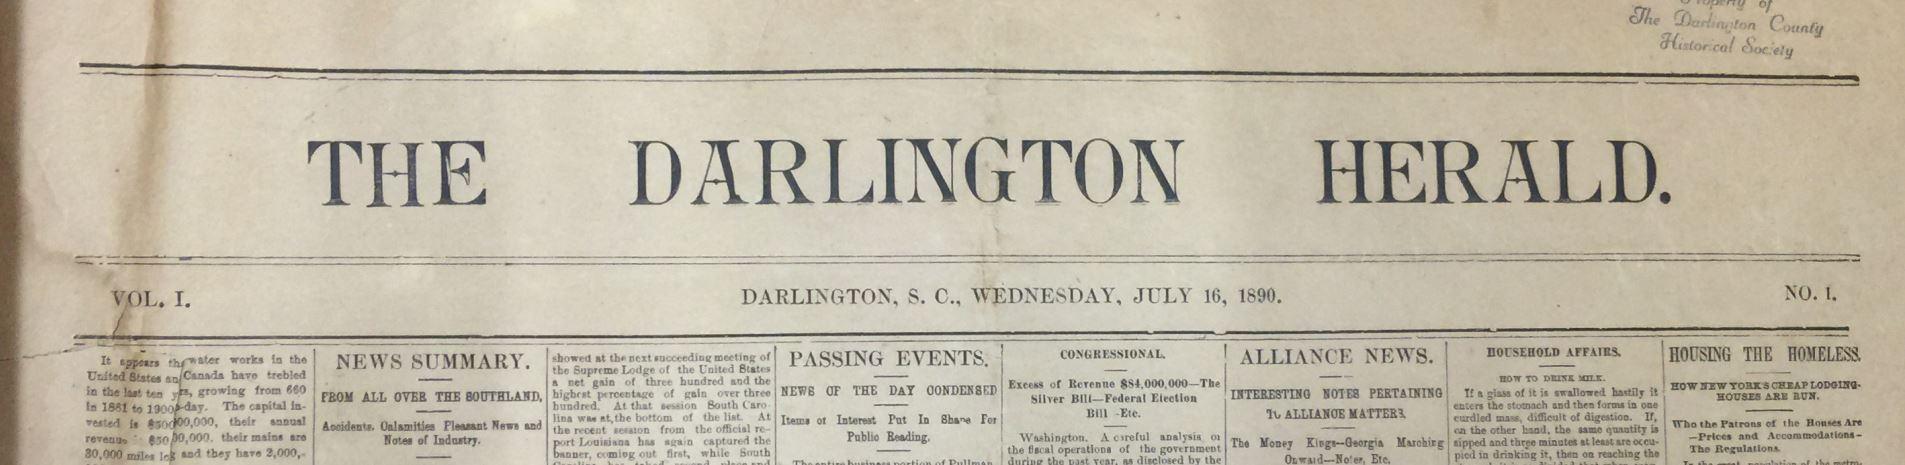 darlington herald.JPG